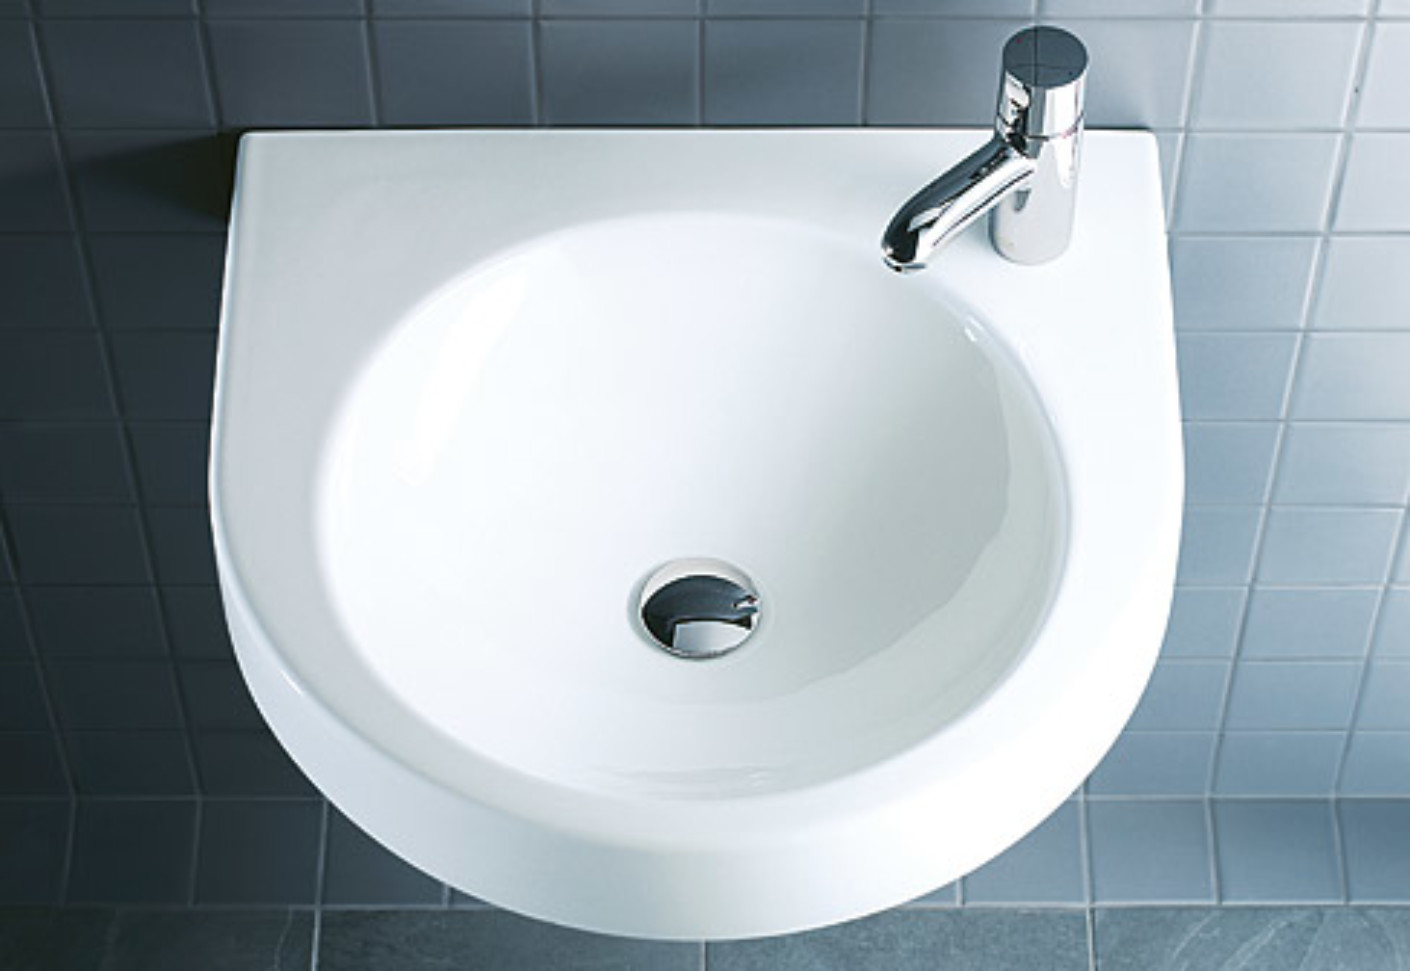 Laundry Basins : Architec wash basin by Duravit STYLEPARK